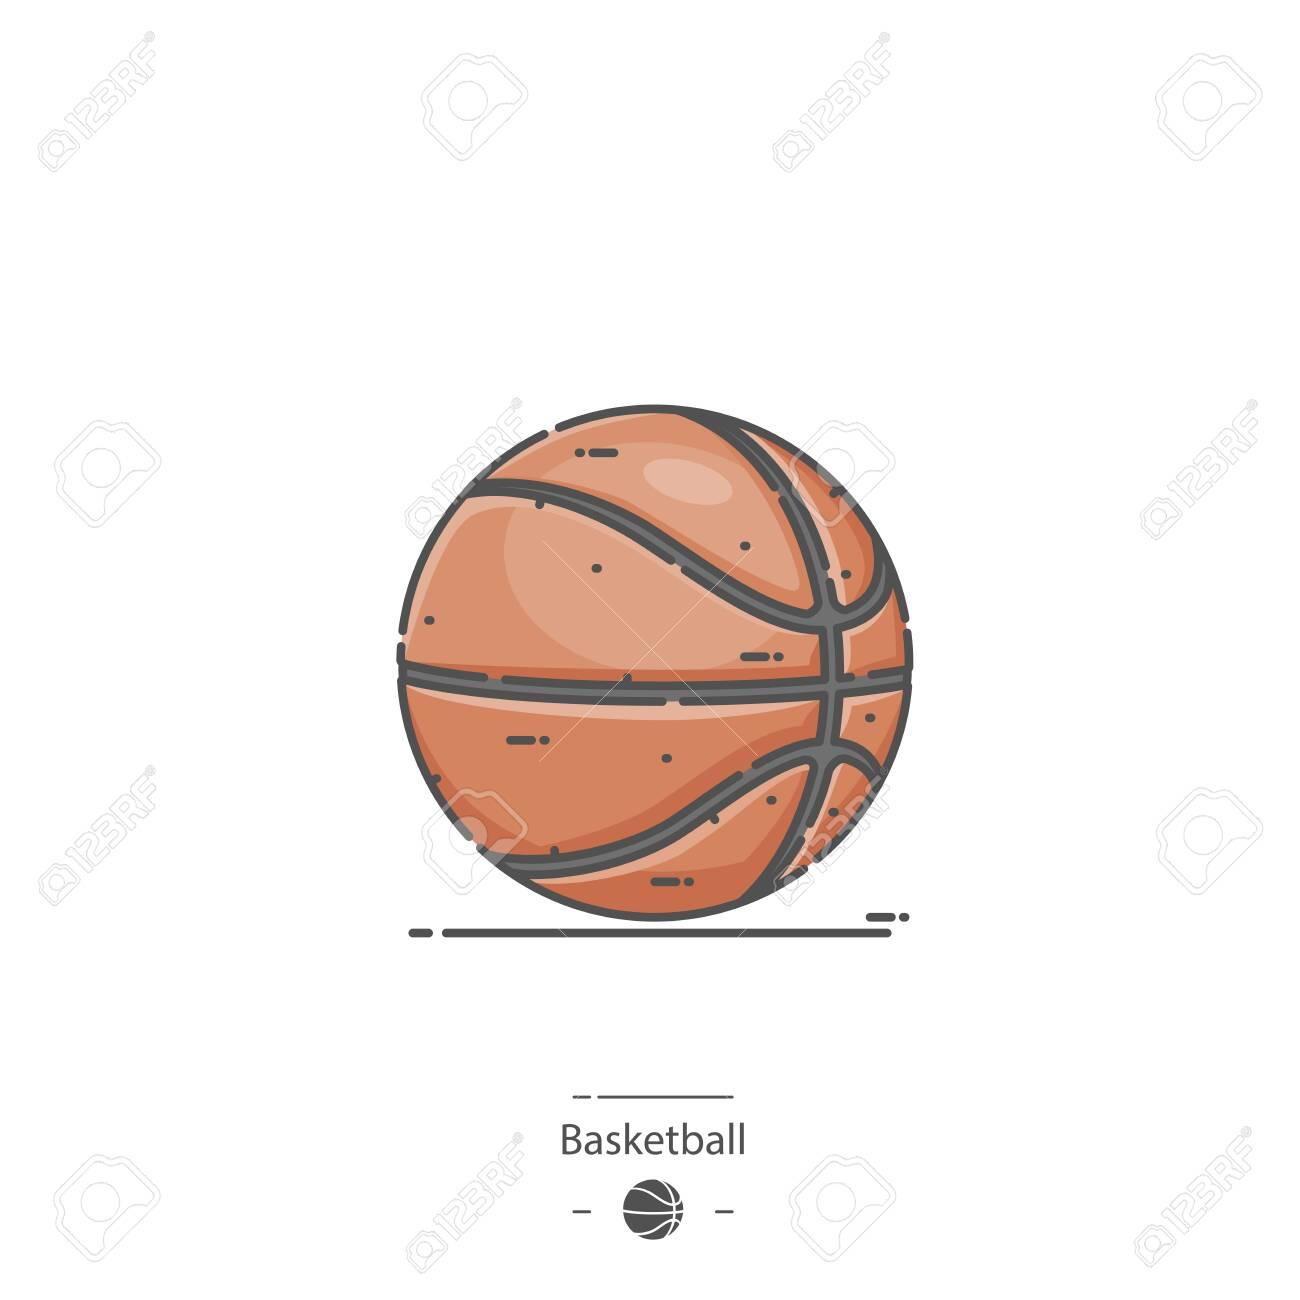 Basketball - Line color icon - 135528435